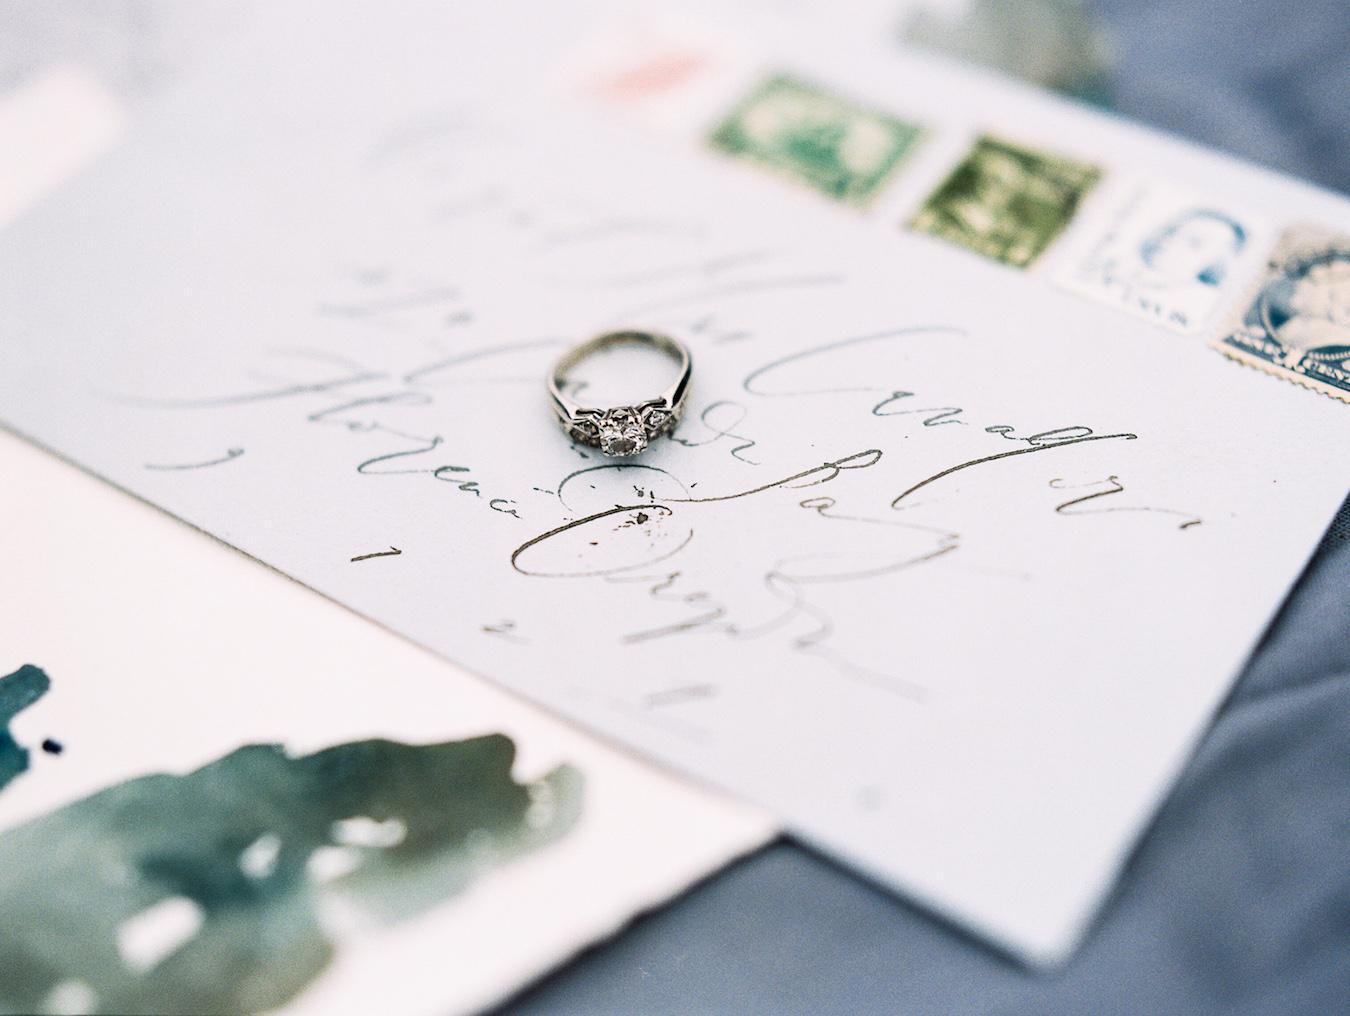 natalie-papova-wedding-stylist-35.jpg